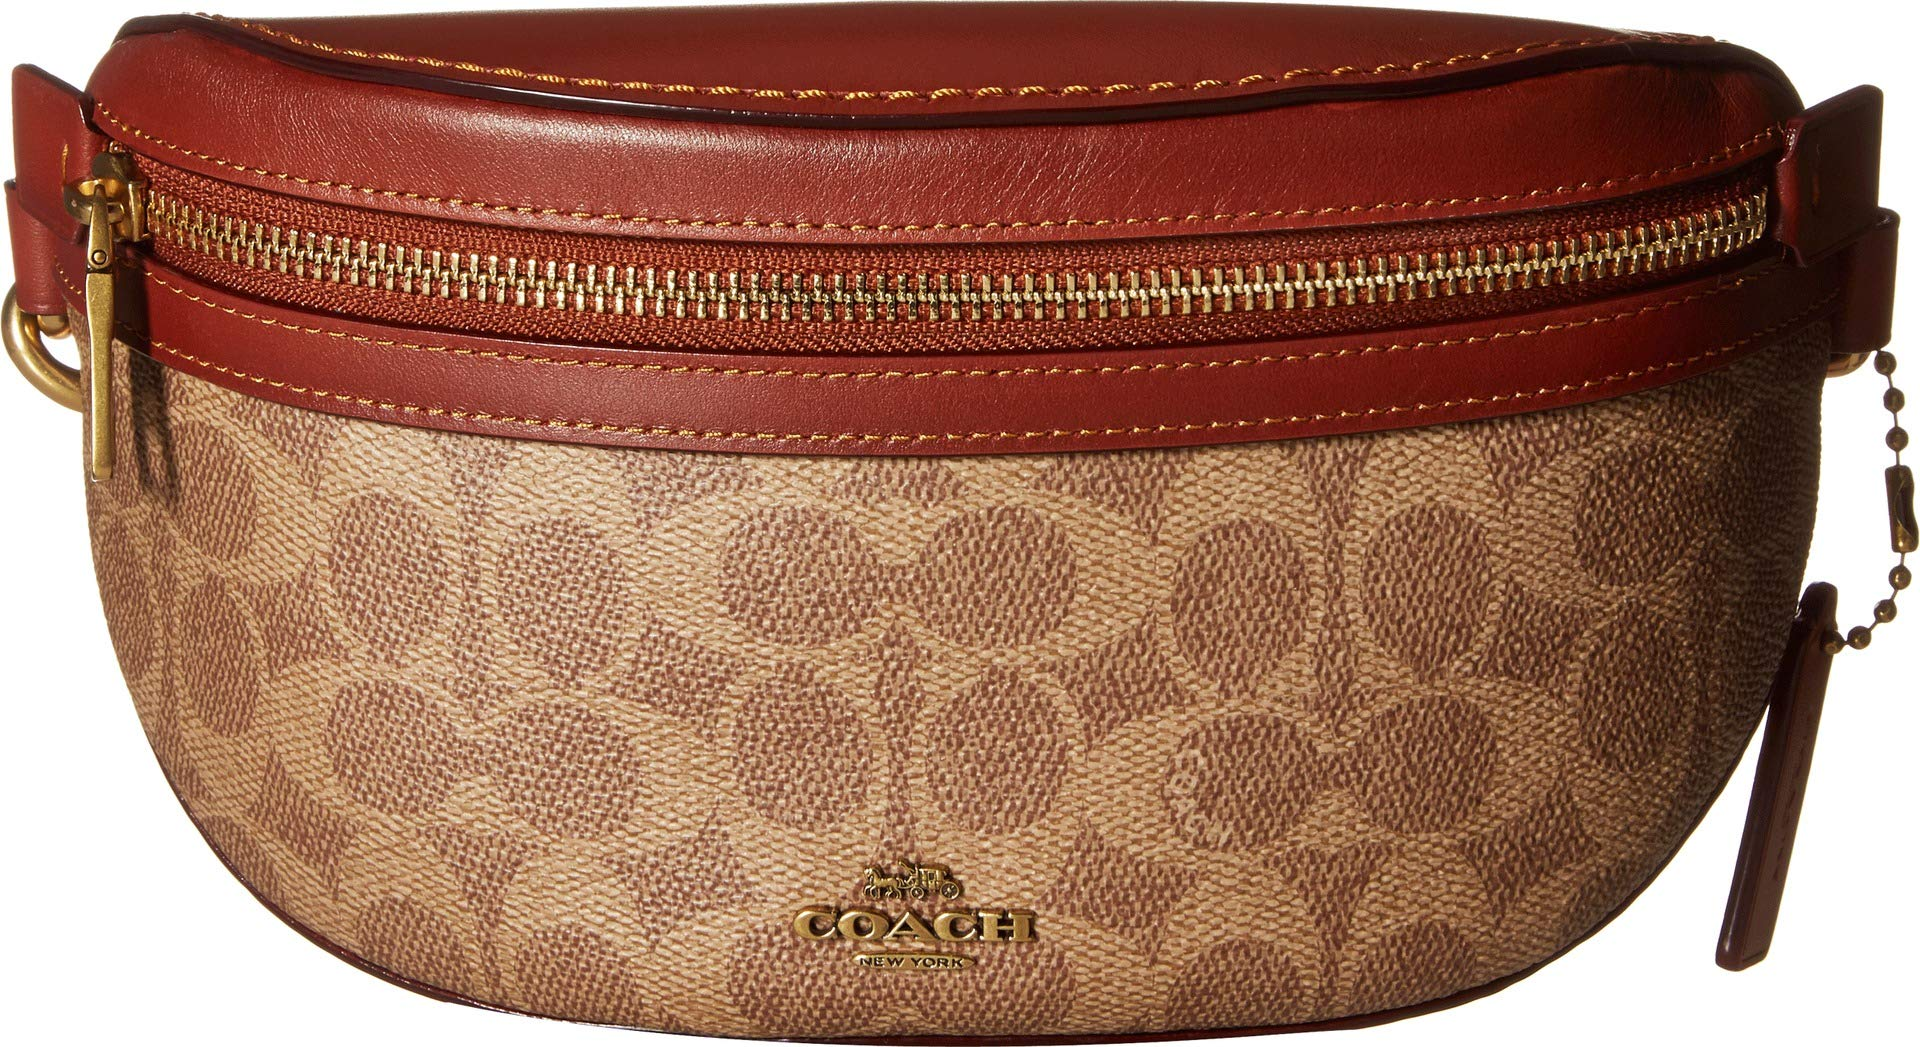 COACH Women's Coated Canvas Signature Belt Bag B4/Tan Rust One Size